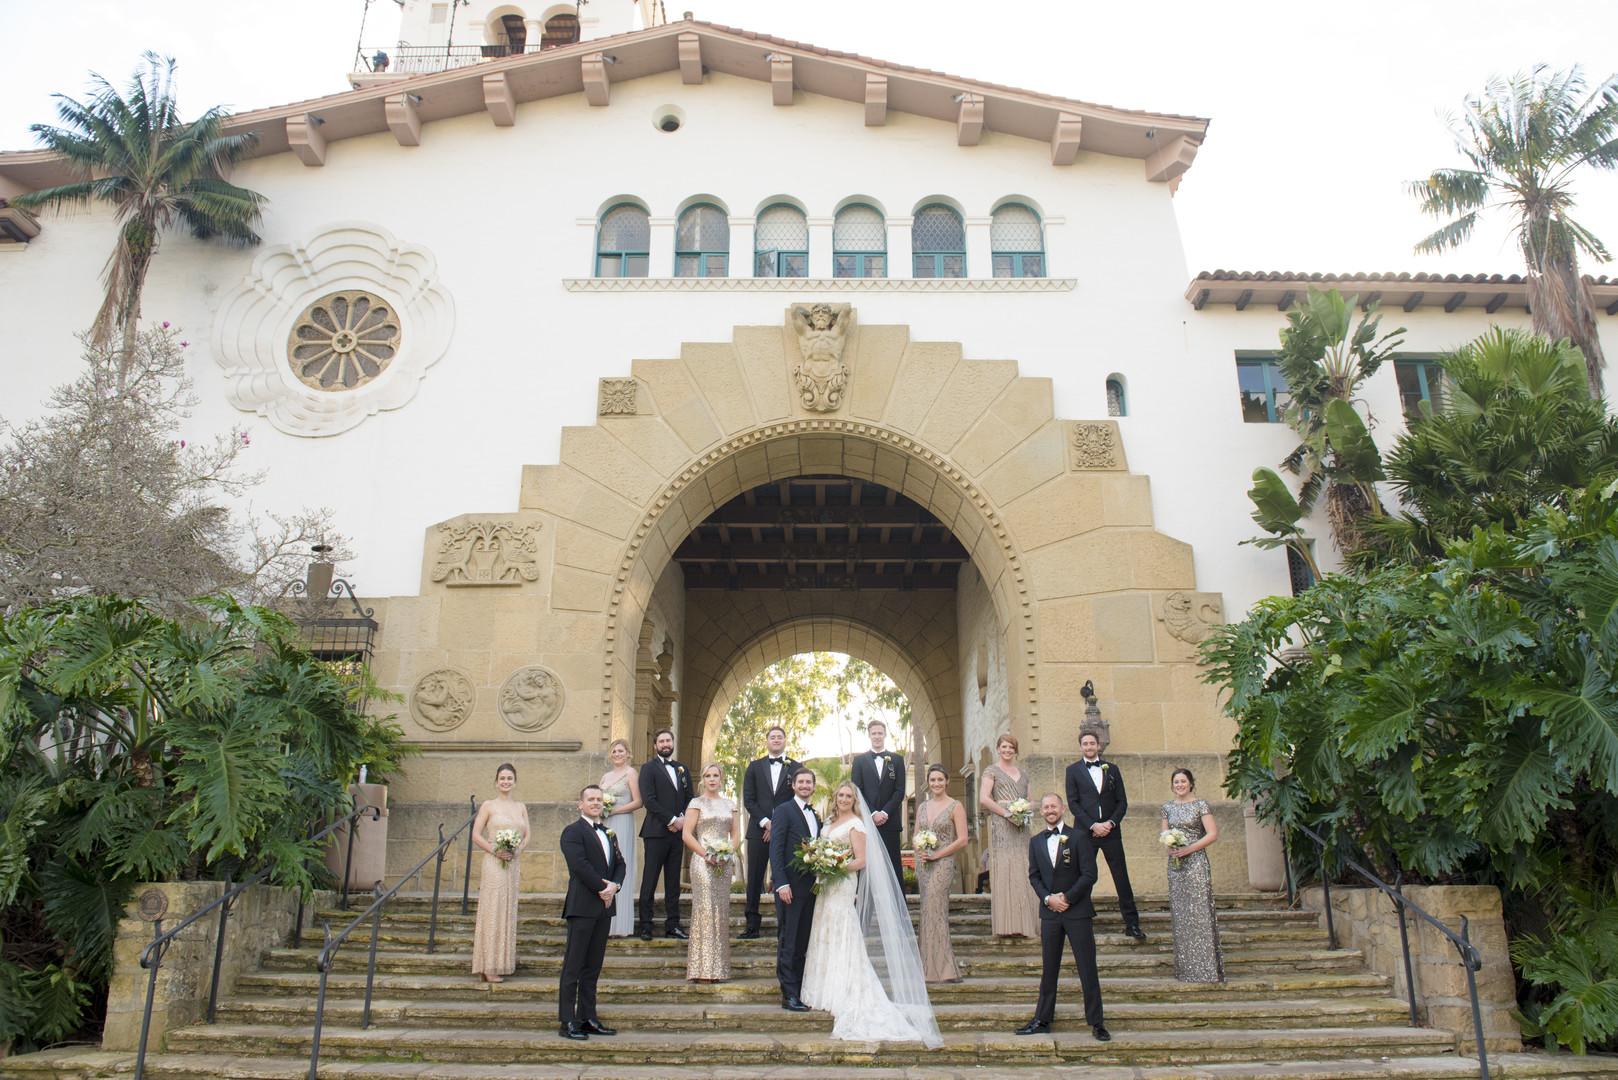 www.santabarbarawedding.com | ByCherry Photo | Hilton Beachfront Resort | Dulce Dia Events | Bridal Party